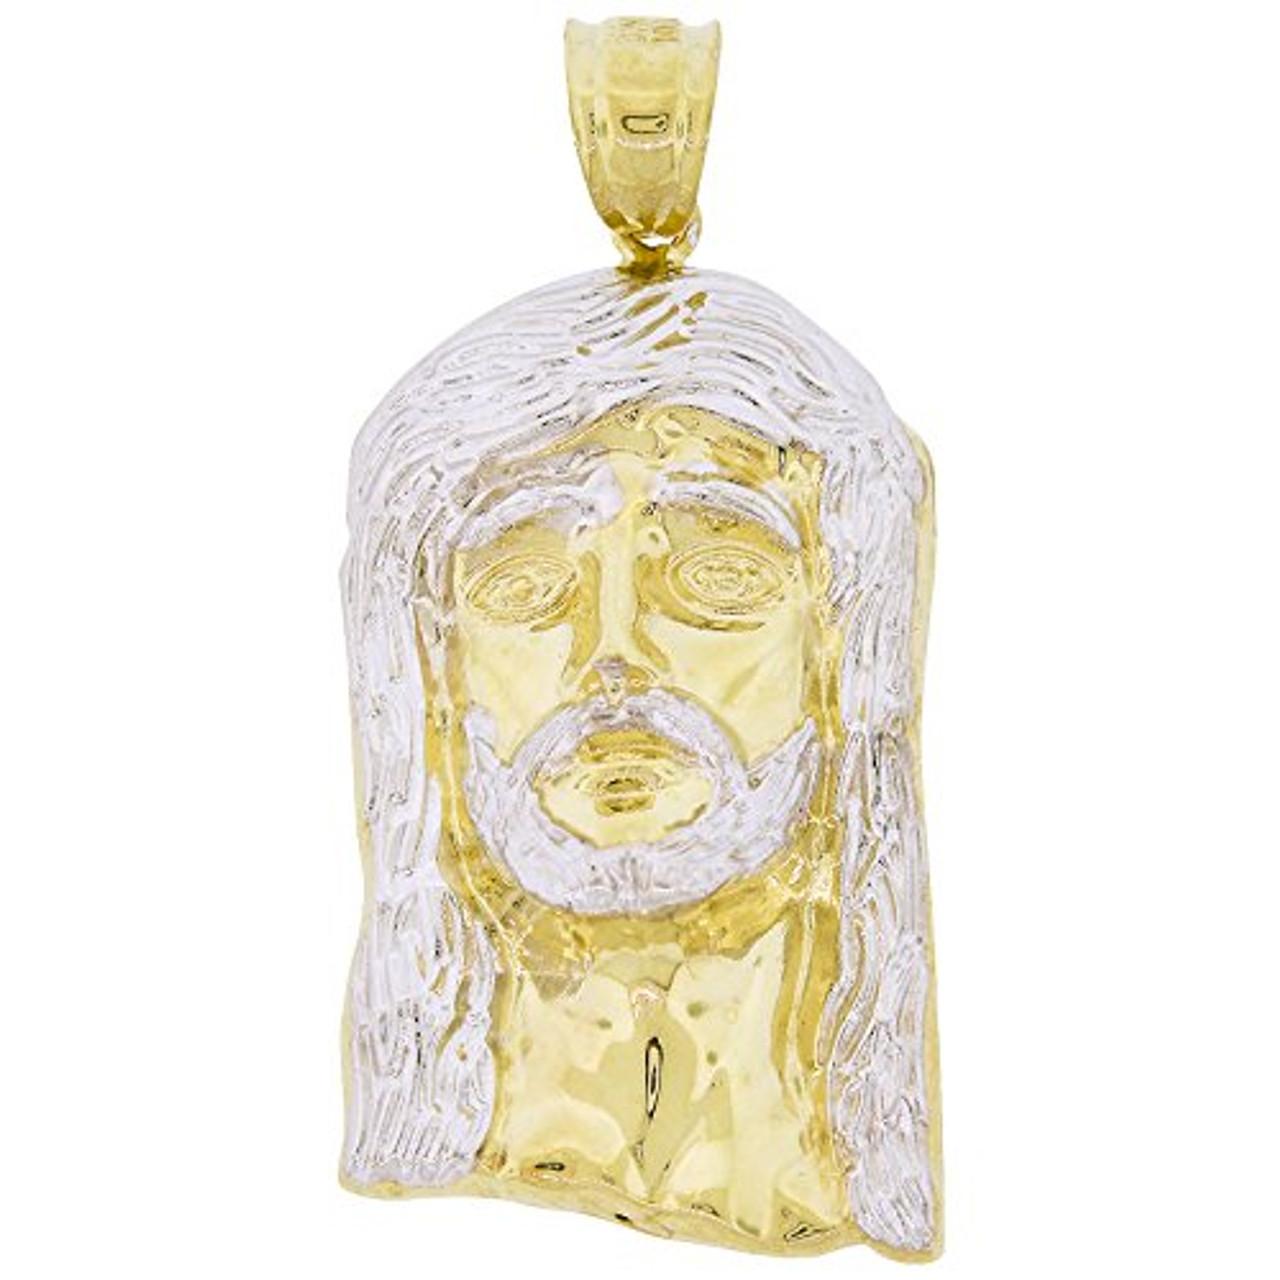 10k Gold Hollow Jesus Piece Pendant Shopjw